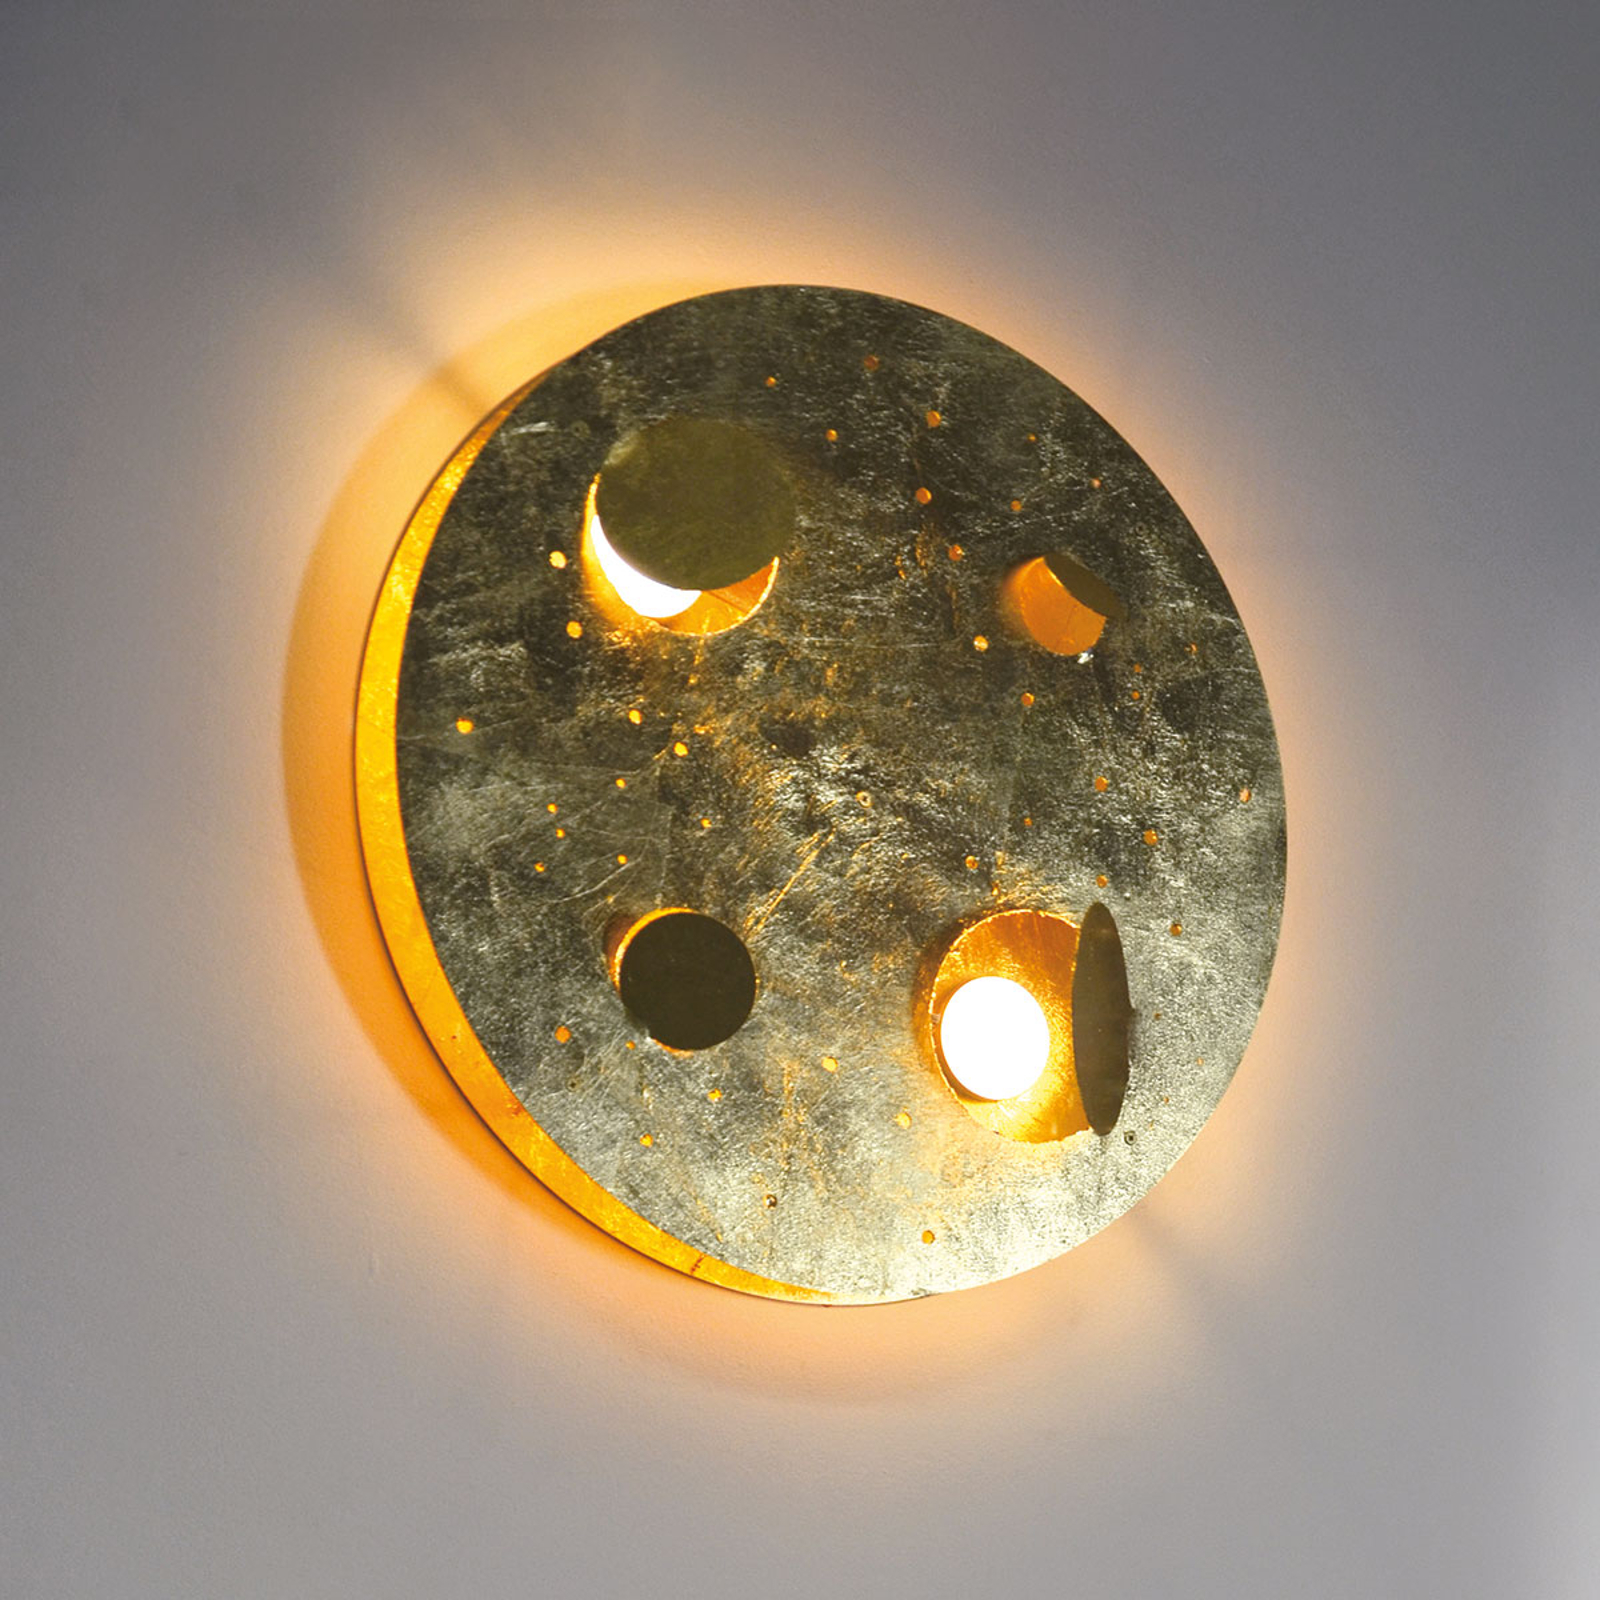 Knikerboker Buchi LED-Wandlampe Ø 40cm blattgold